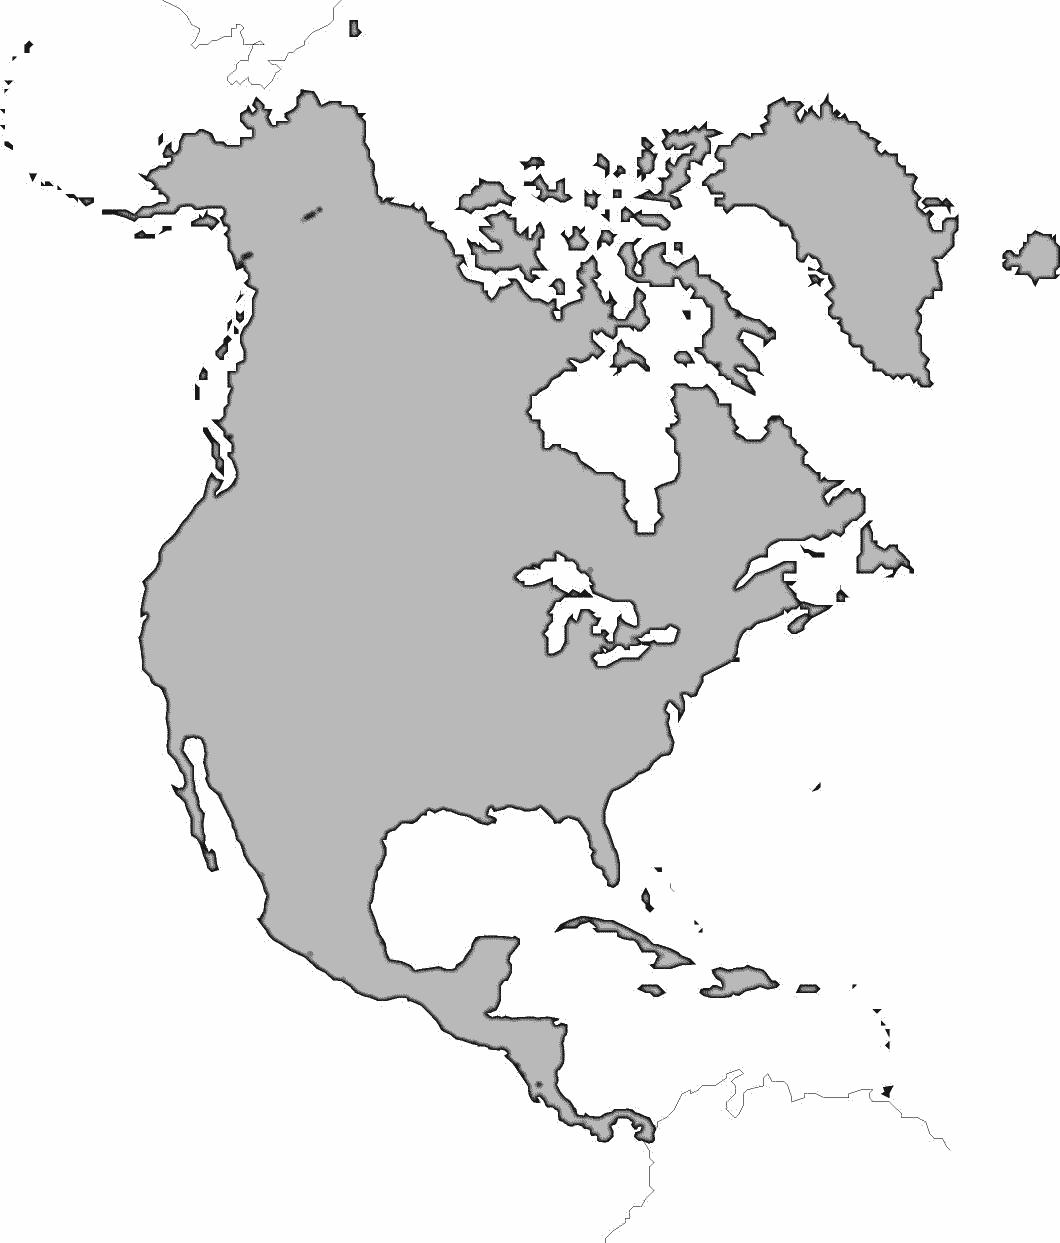 North America Large BW-North America Large BW-13